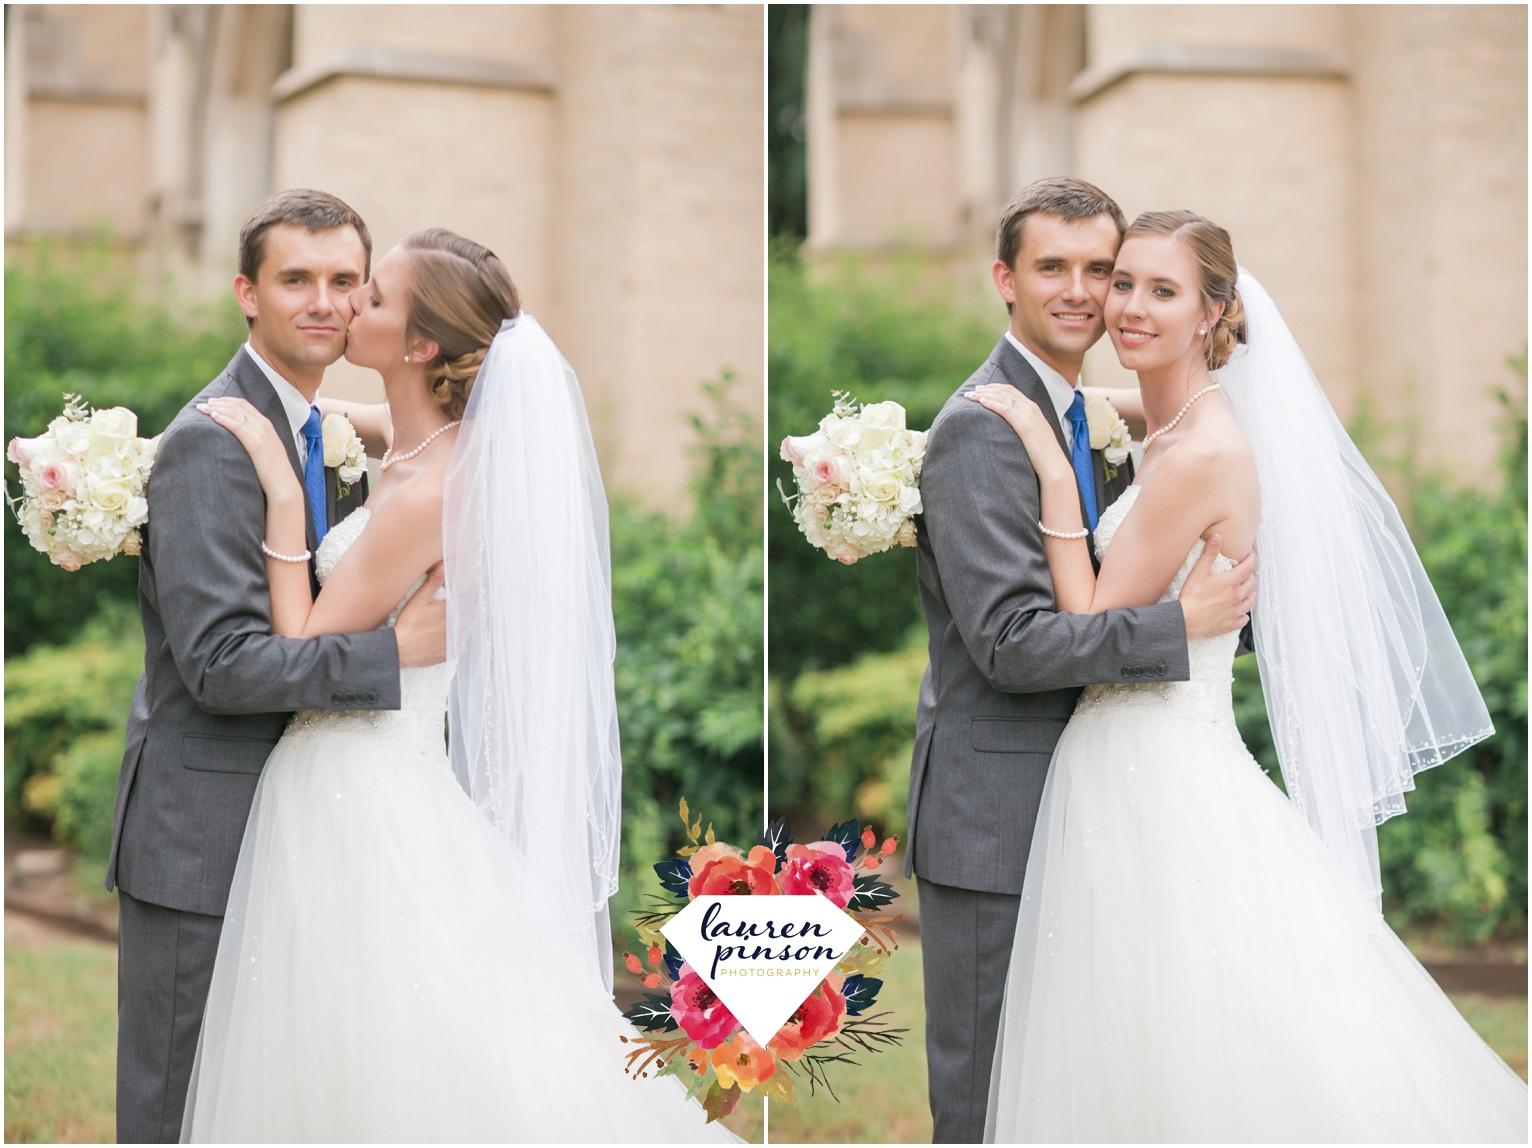 wichita-falls-wedding-photography-at-fain-presbyterian-church-and-the-wellington-timeless-classic-modern-photographer_1167.jpg